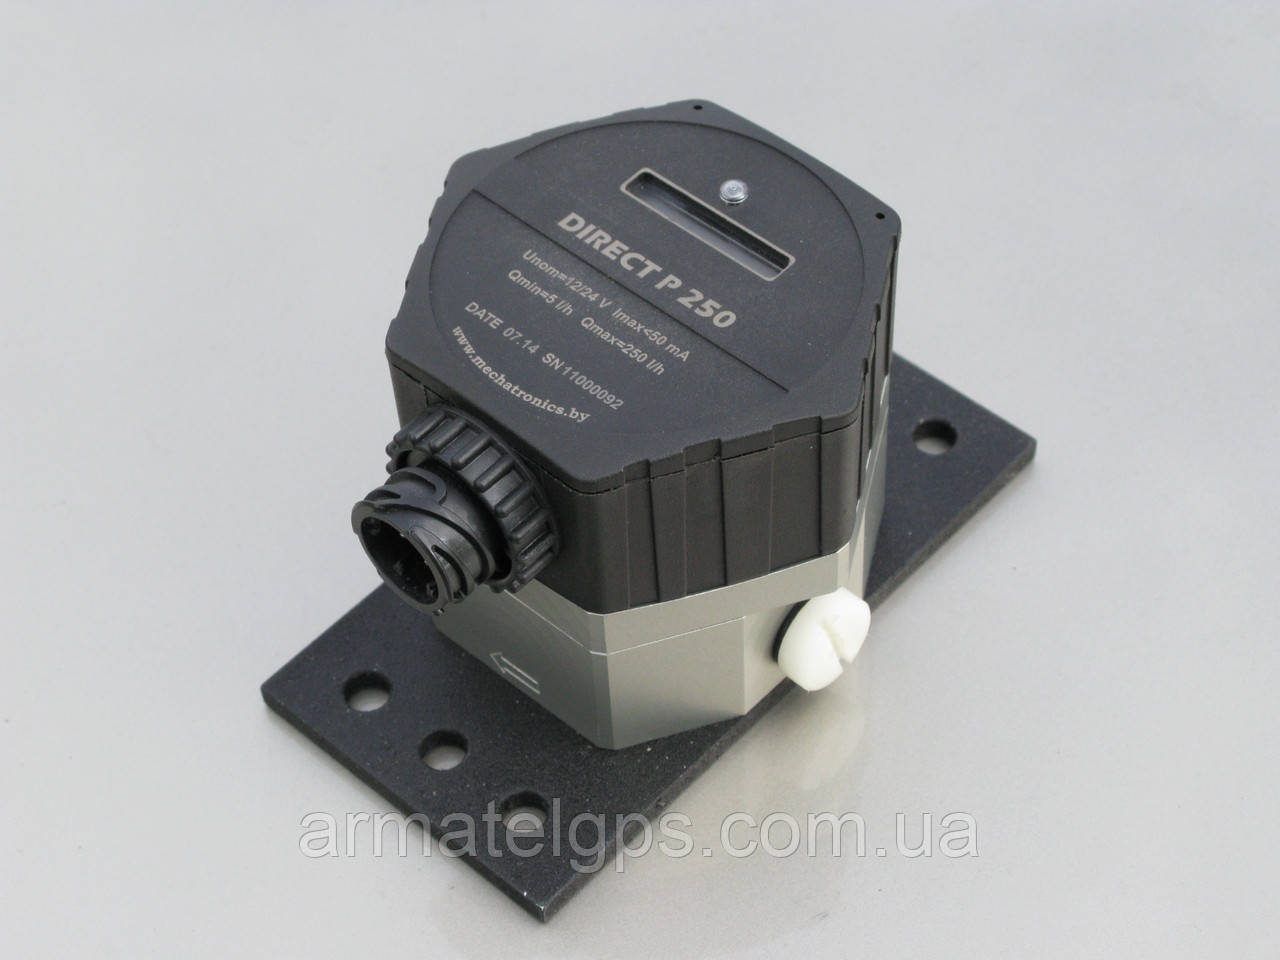 Датчик расхода топлива Eurosens Direct PN250 I (С дисплеем), фото 1